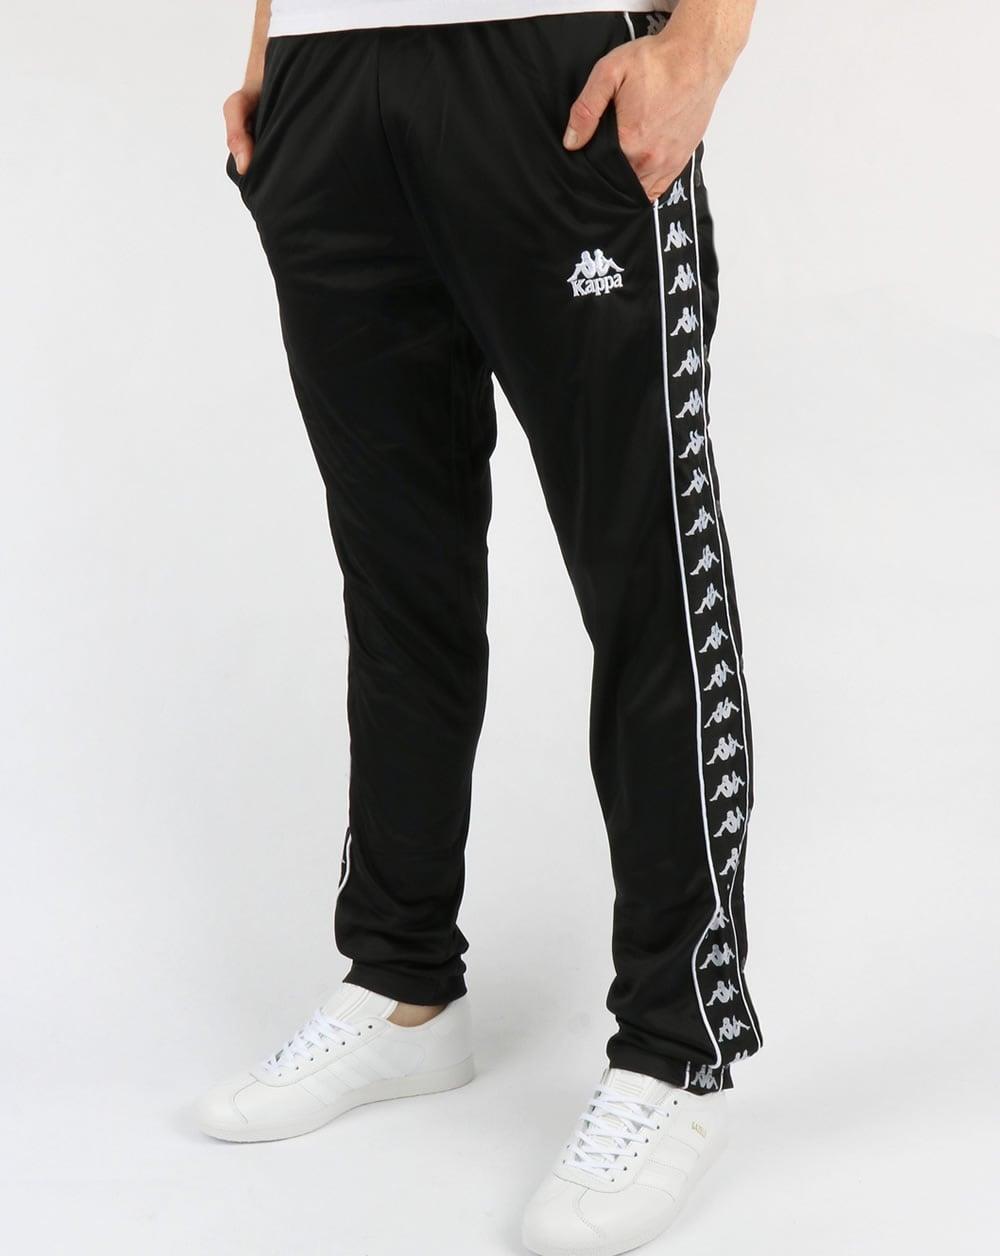 49940ae437 Kappa Classic Popper Track Pants Black